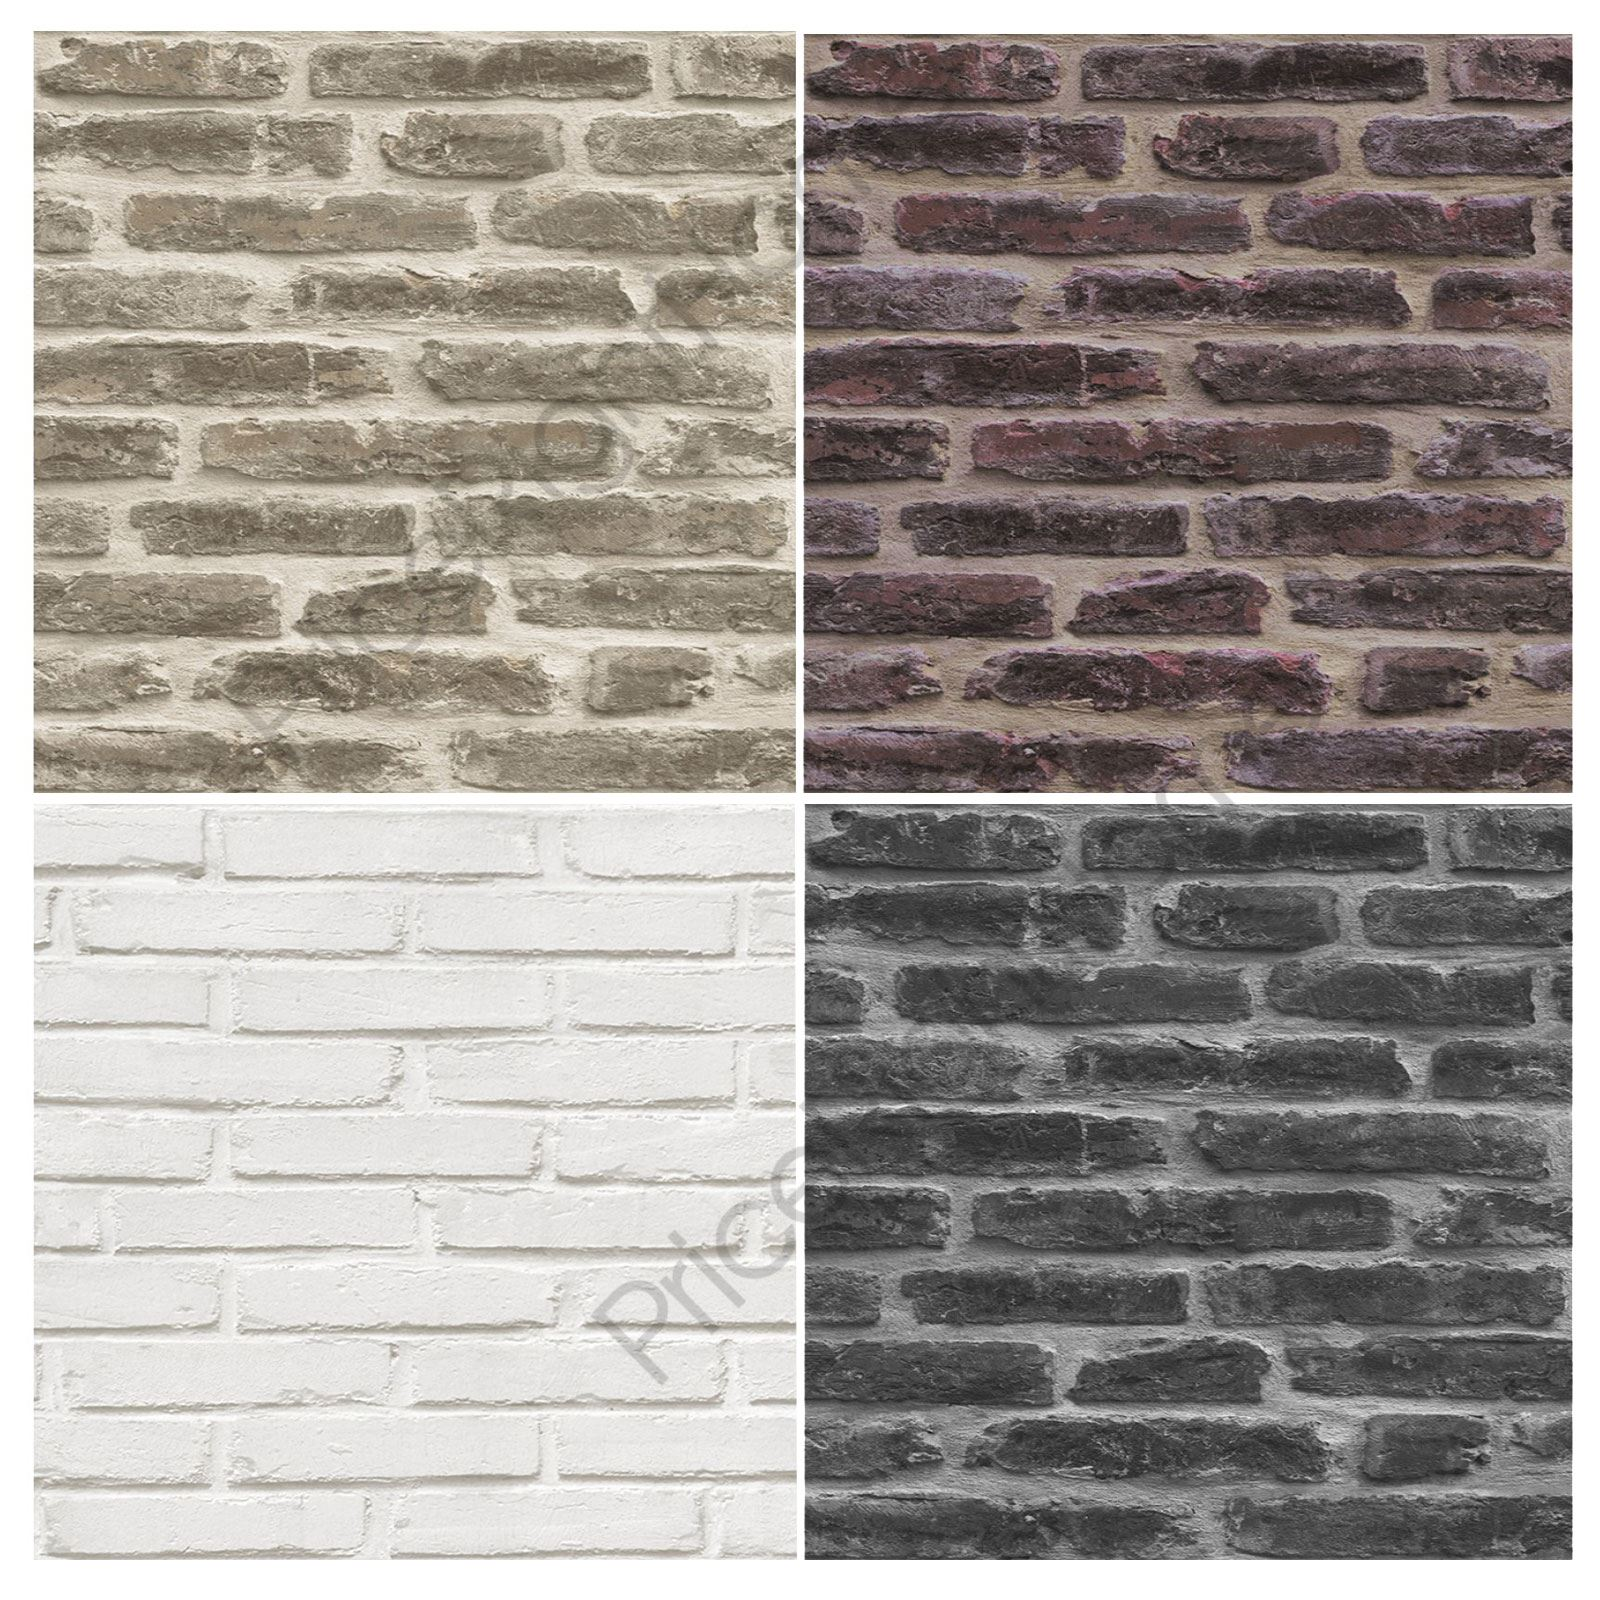 Rustic brick wallpaper roll red brown white black for Black brick wallpaper bedroom